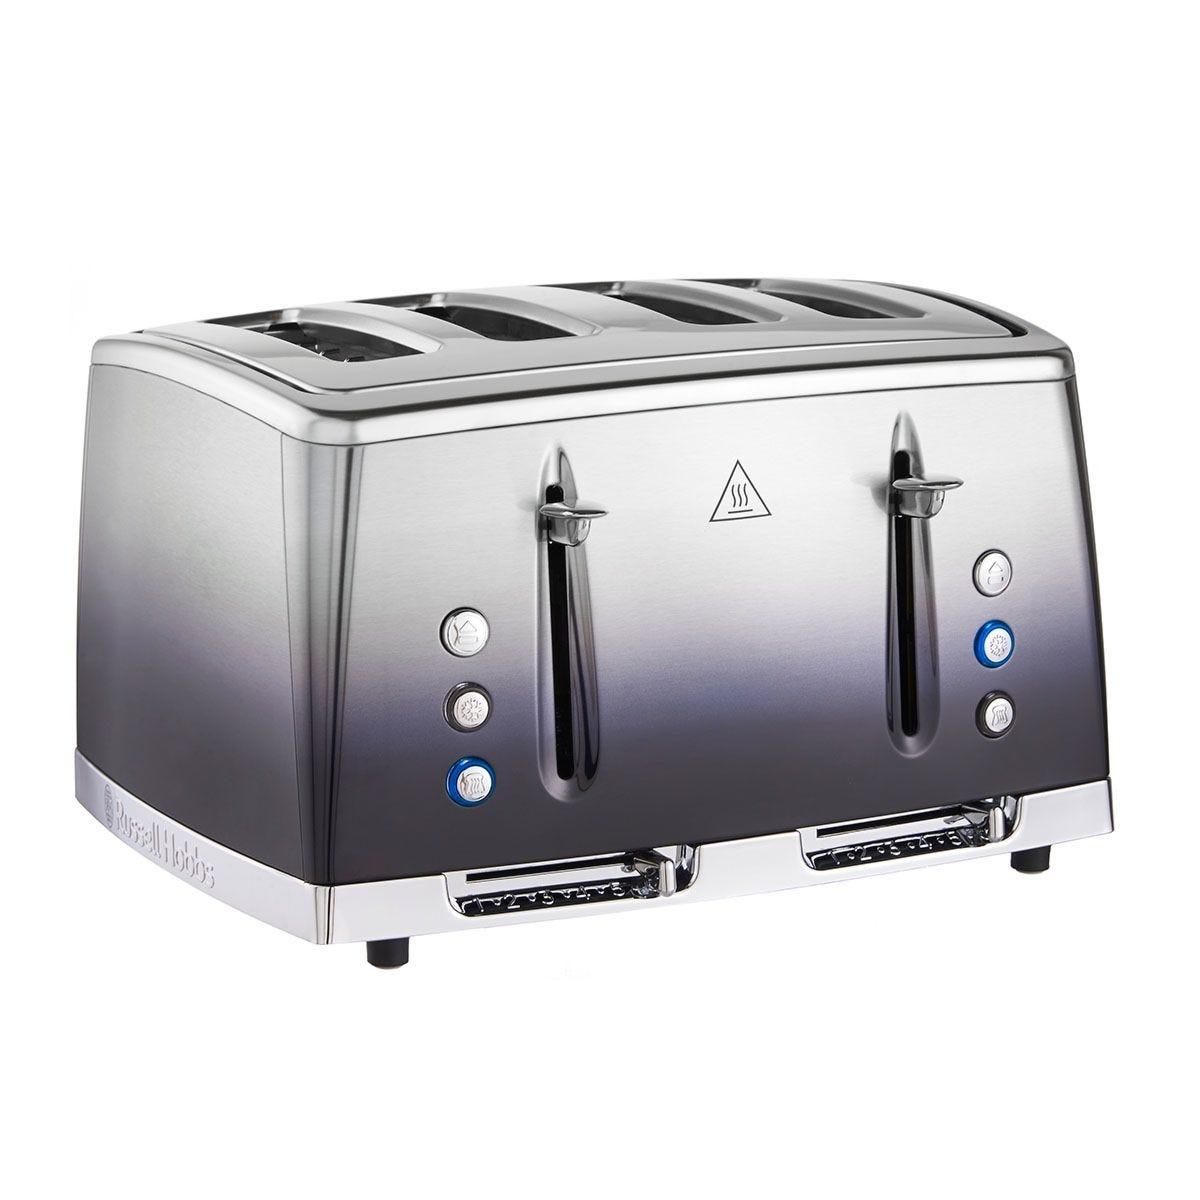 Russell Hobbs 25141 Eclipse 4–Slice Toaster – Midnight Blue